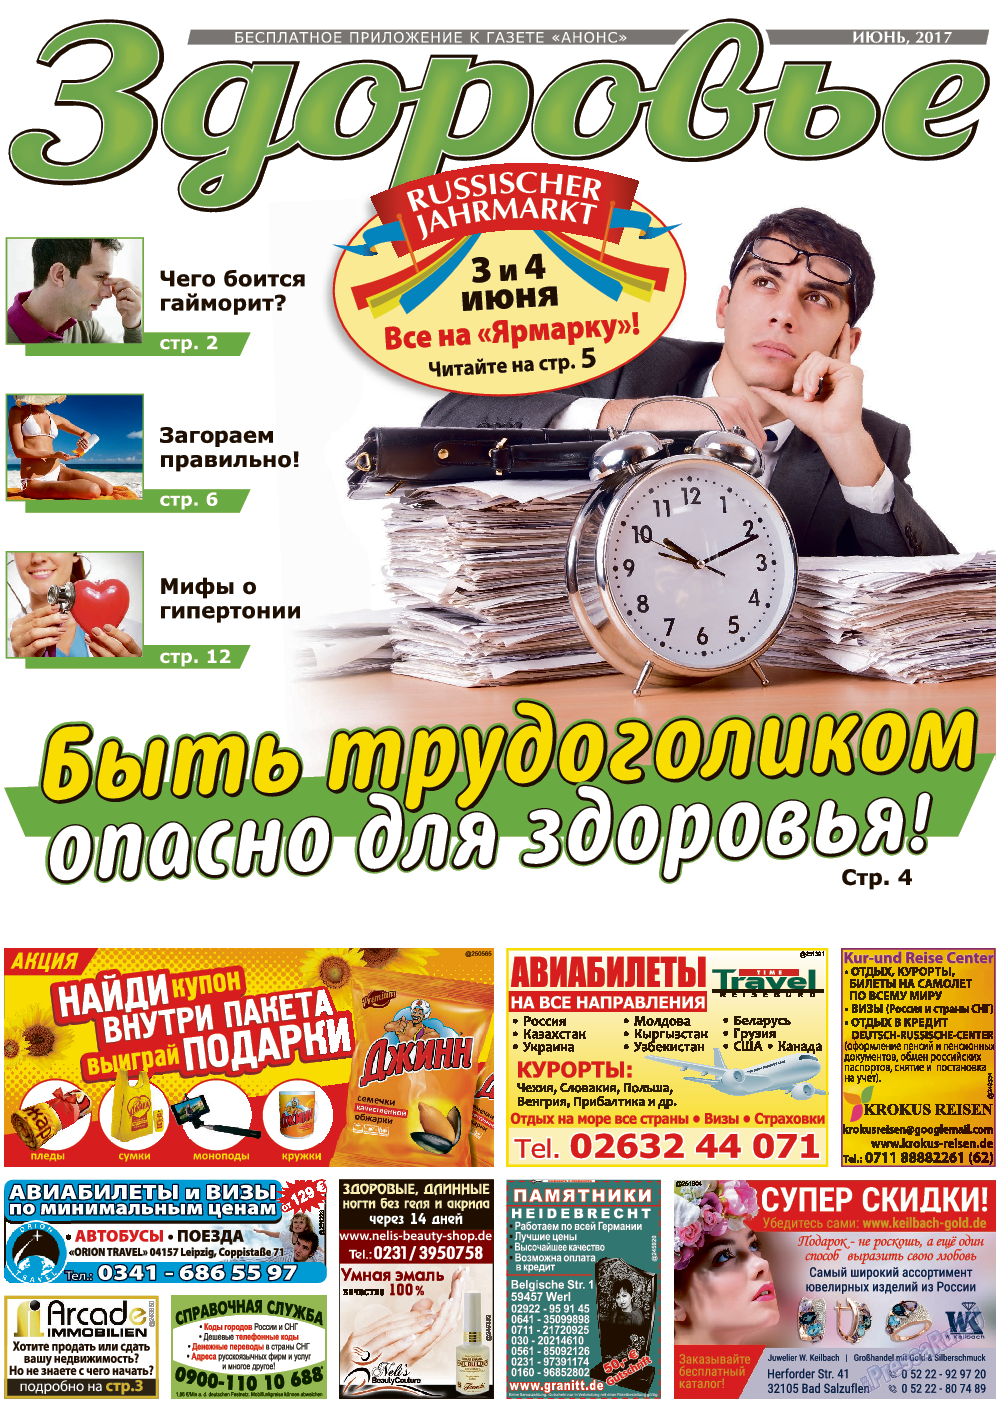 Здоровье (газета). 2017 год, номер 6, стр. 1